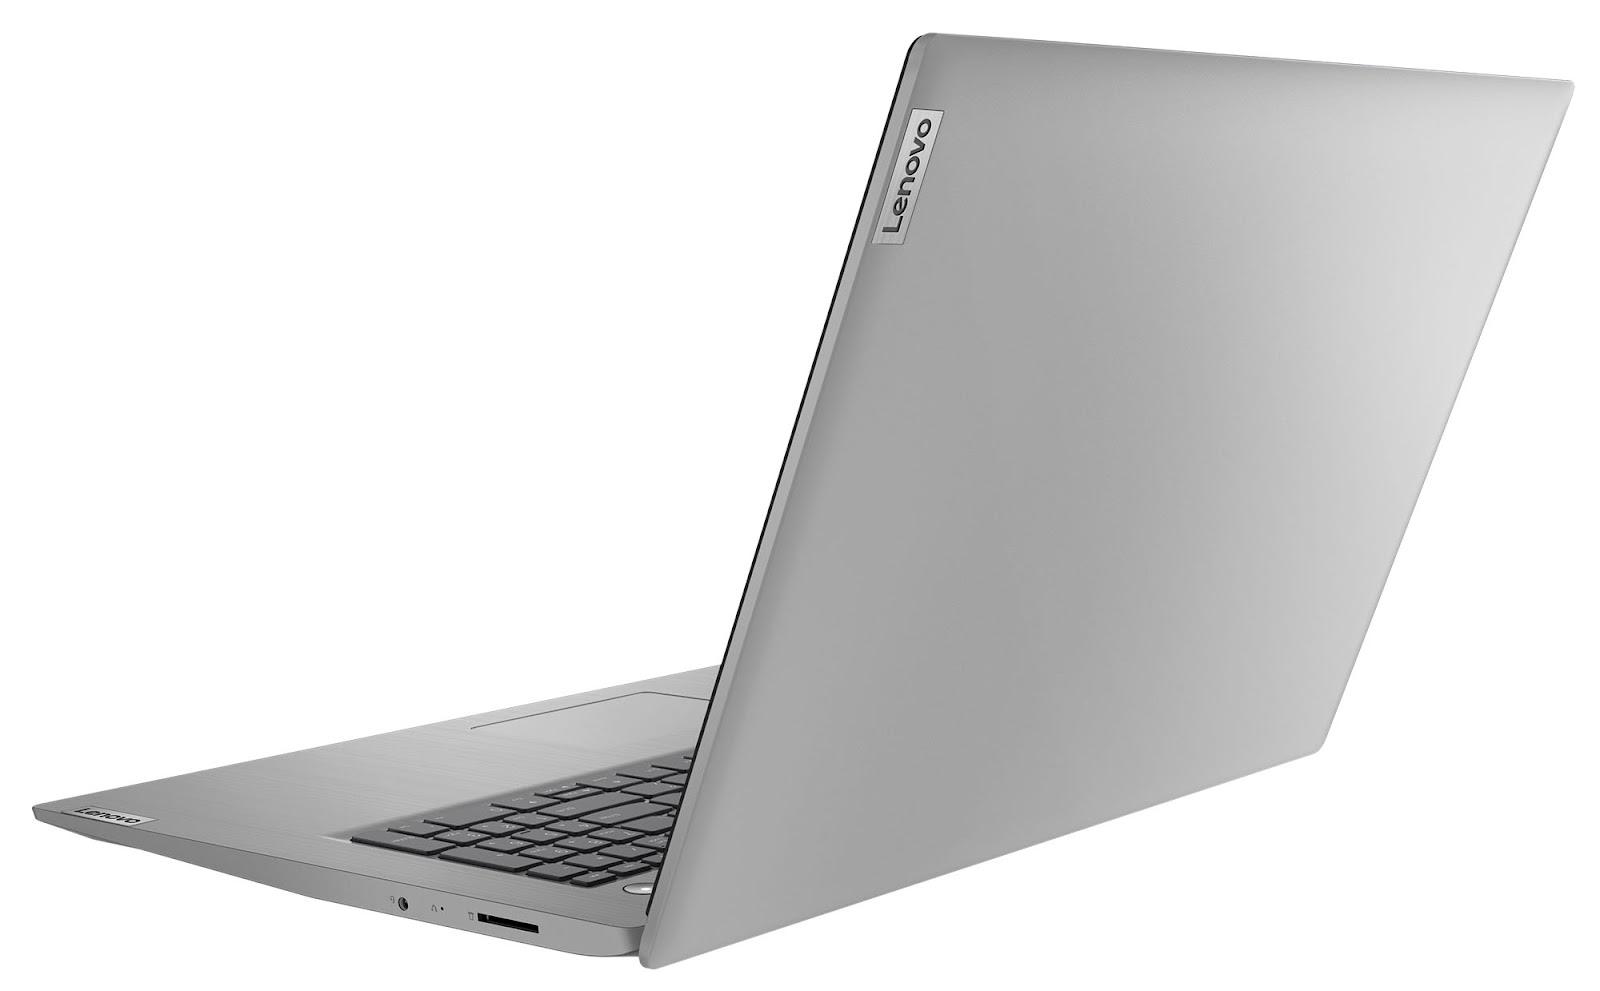 Фото 1. Ноутбук Lenovo ideapad 3 17ADA05 Platinum Grey (81W20067RE)